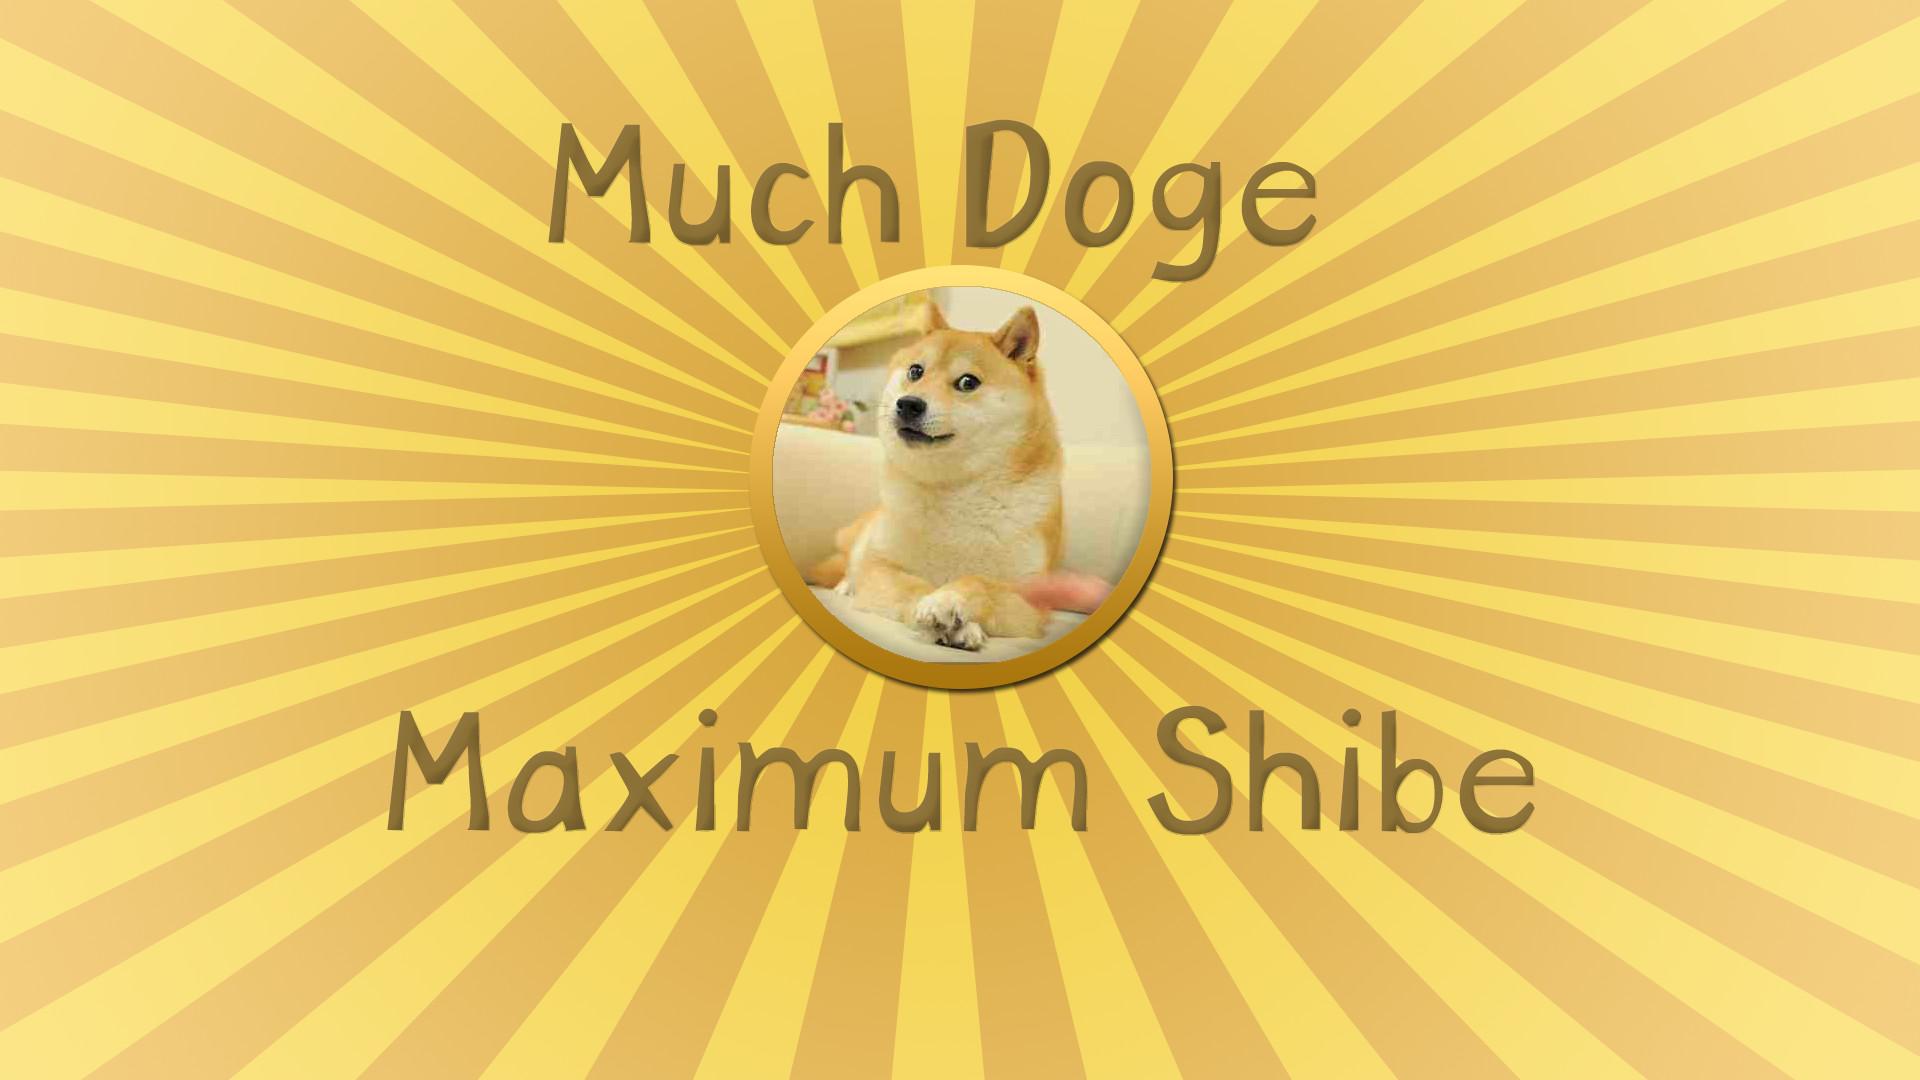 Doge Meme Wallpaper | Funny Cat & Dog Pictures